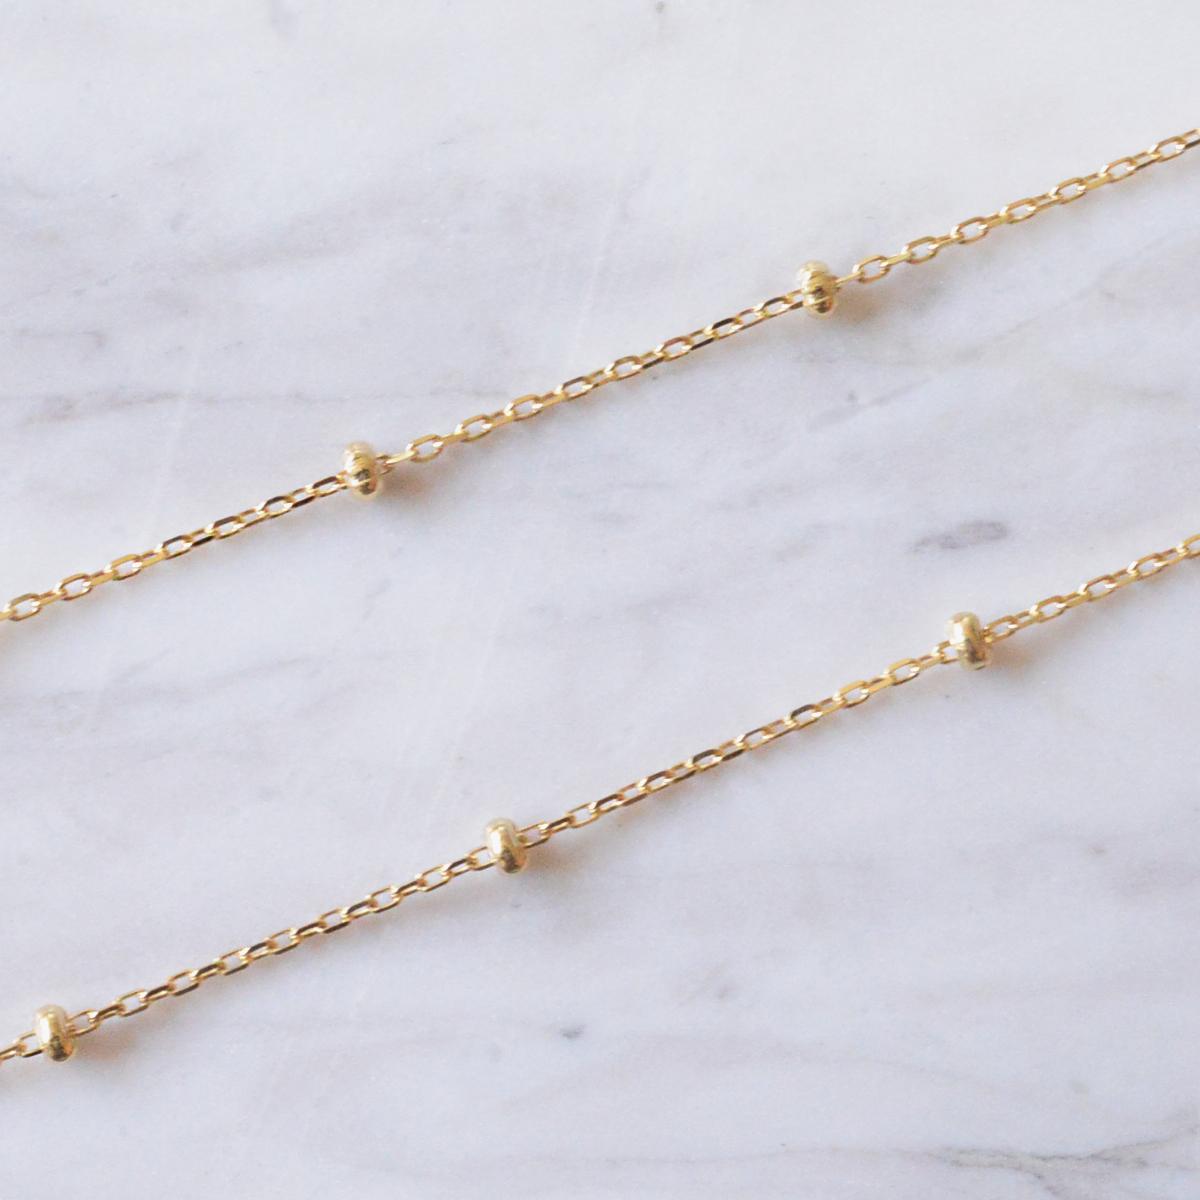 k18ネックレス K18 イエローゴールド スタッド アズキチェーン ビーズ幅1.7mm チェーン 45cm/ プレゼント ギフト gold necklace ach1663c45